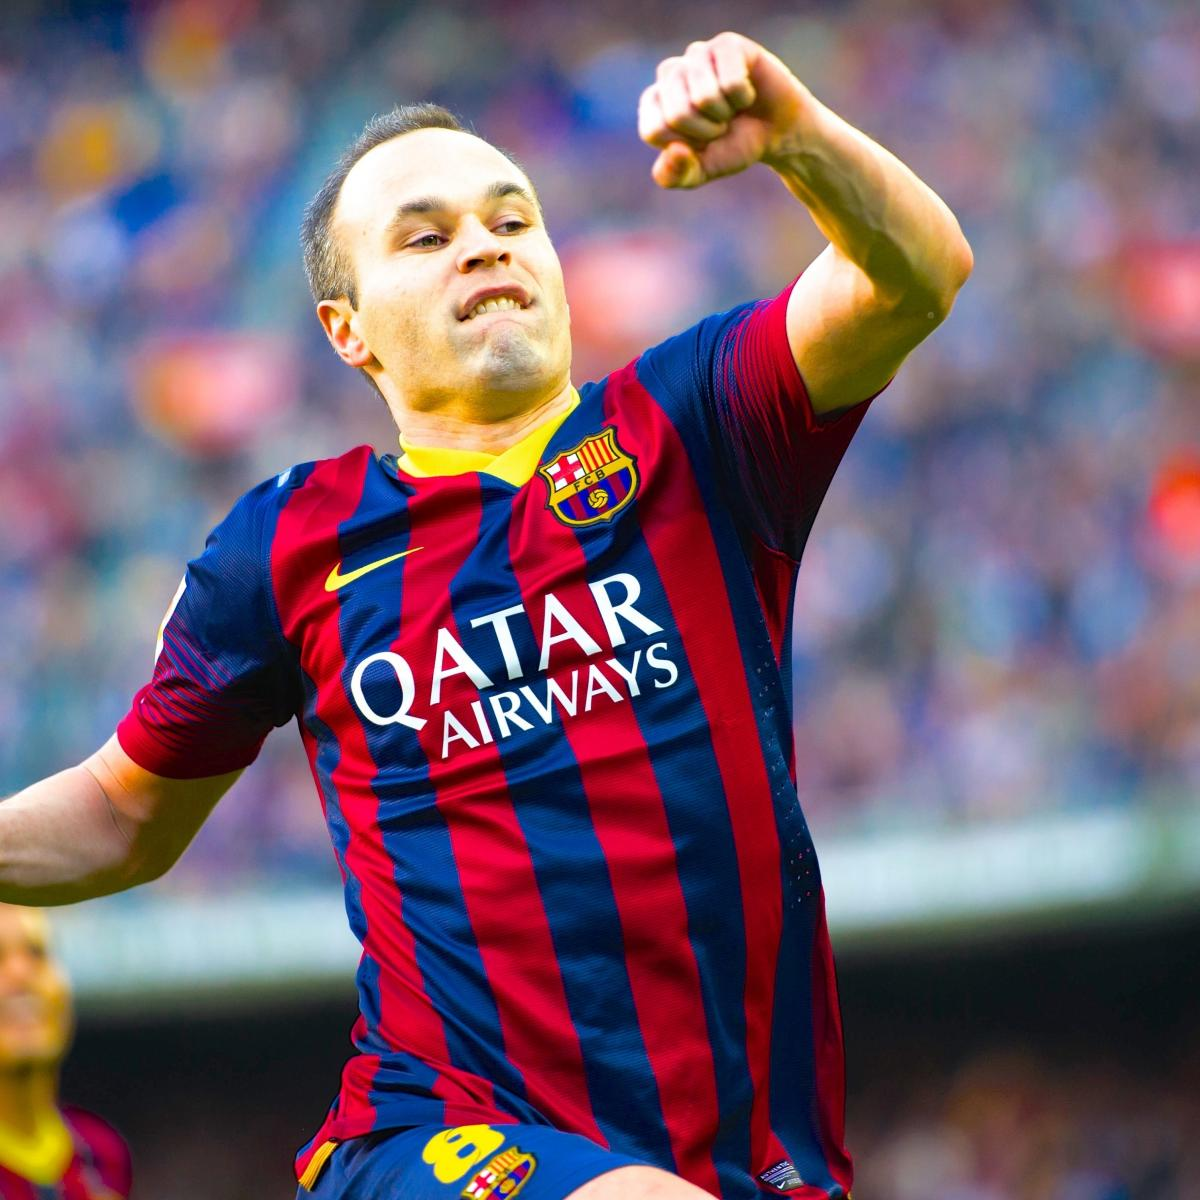 Liverpool V Barcelona Live Matchday Blog: Espanyol Vs. Barcelona: La Liga Live Score, Highlights